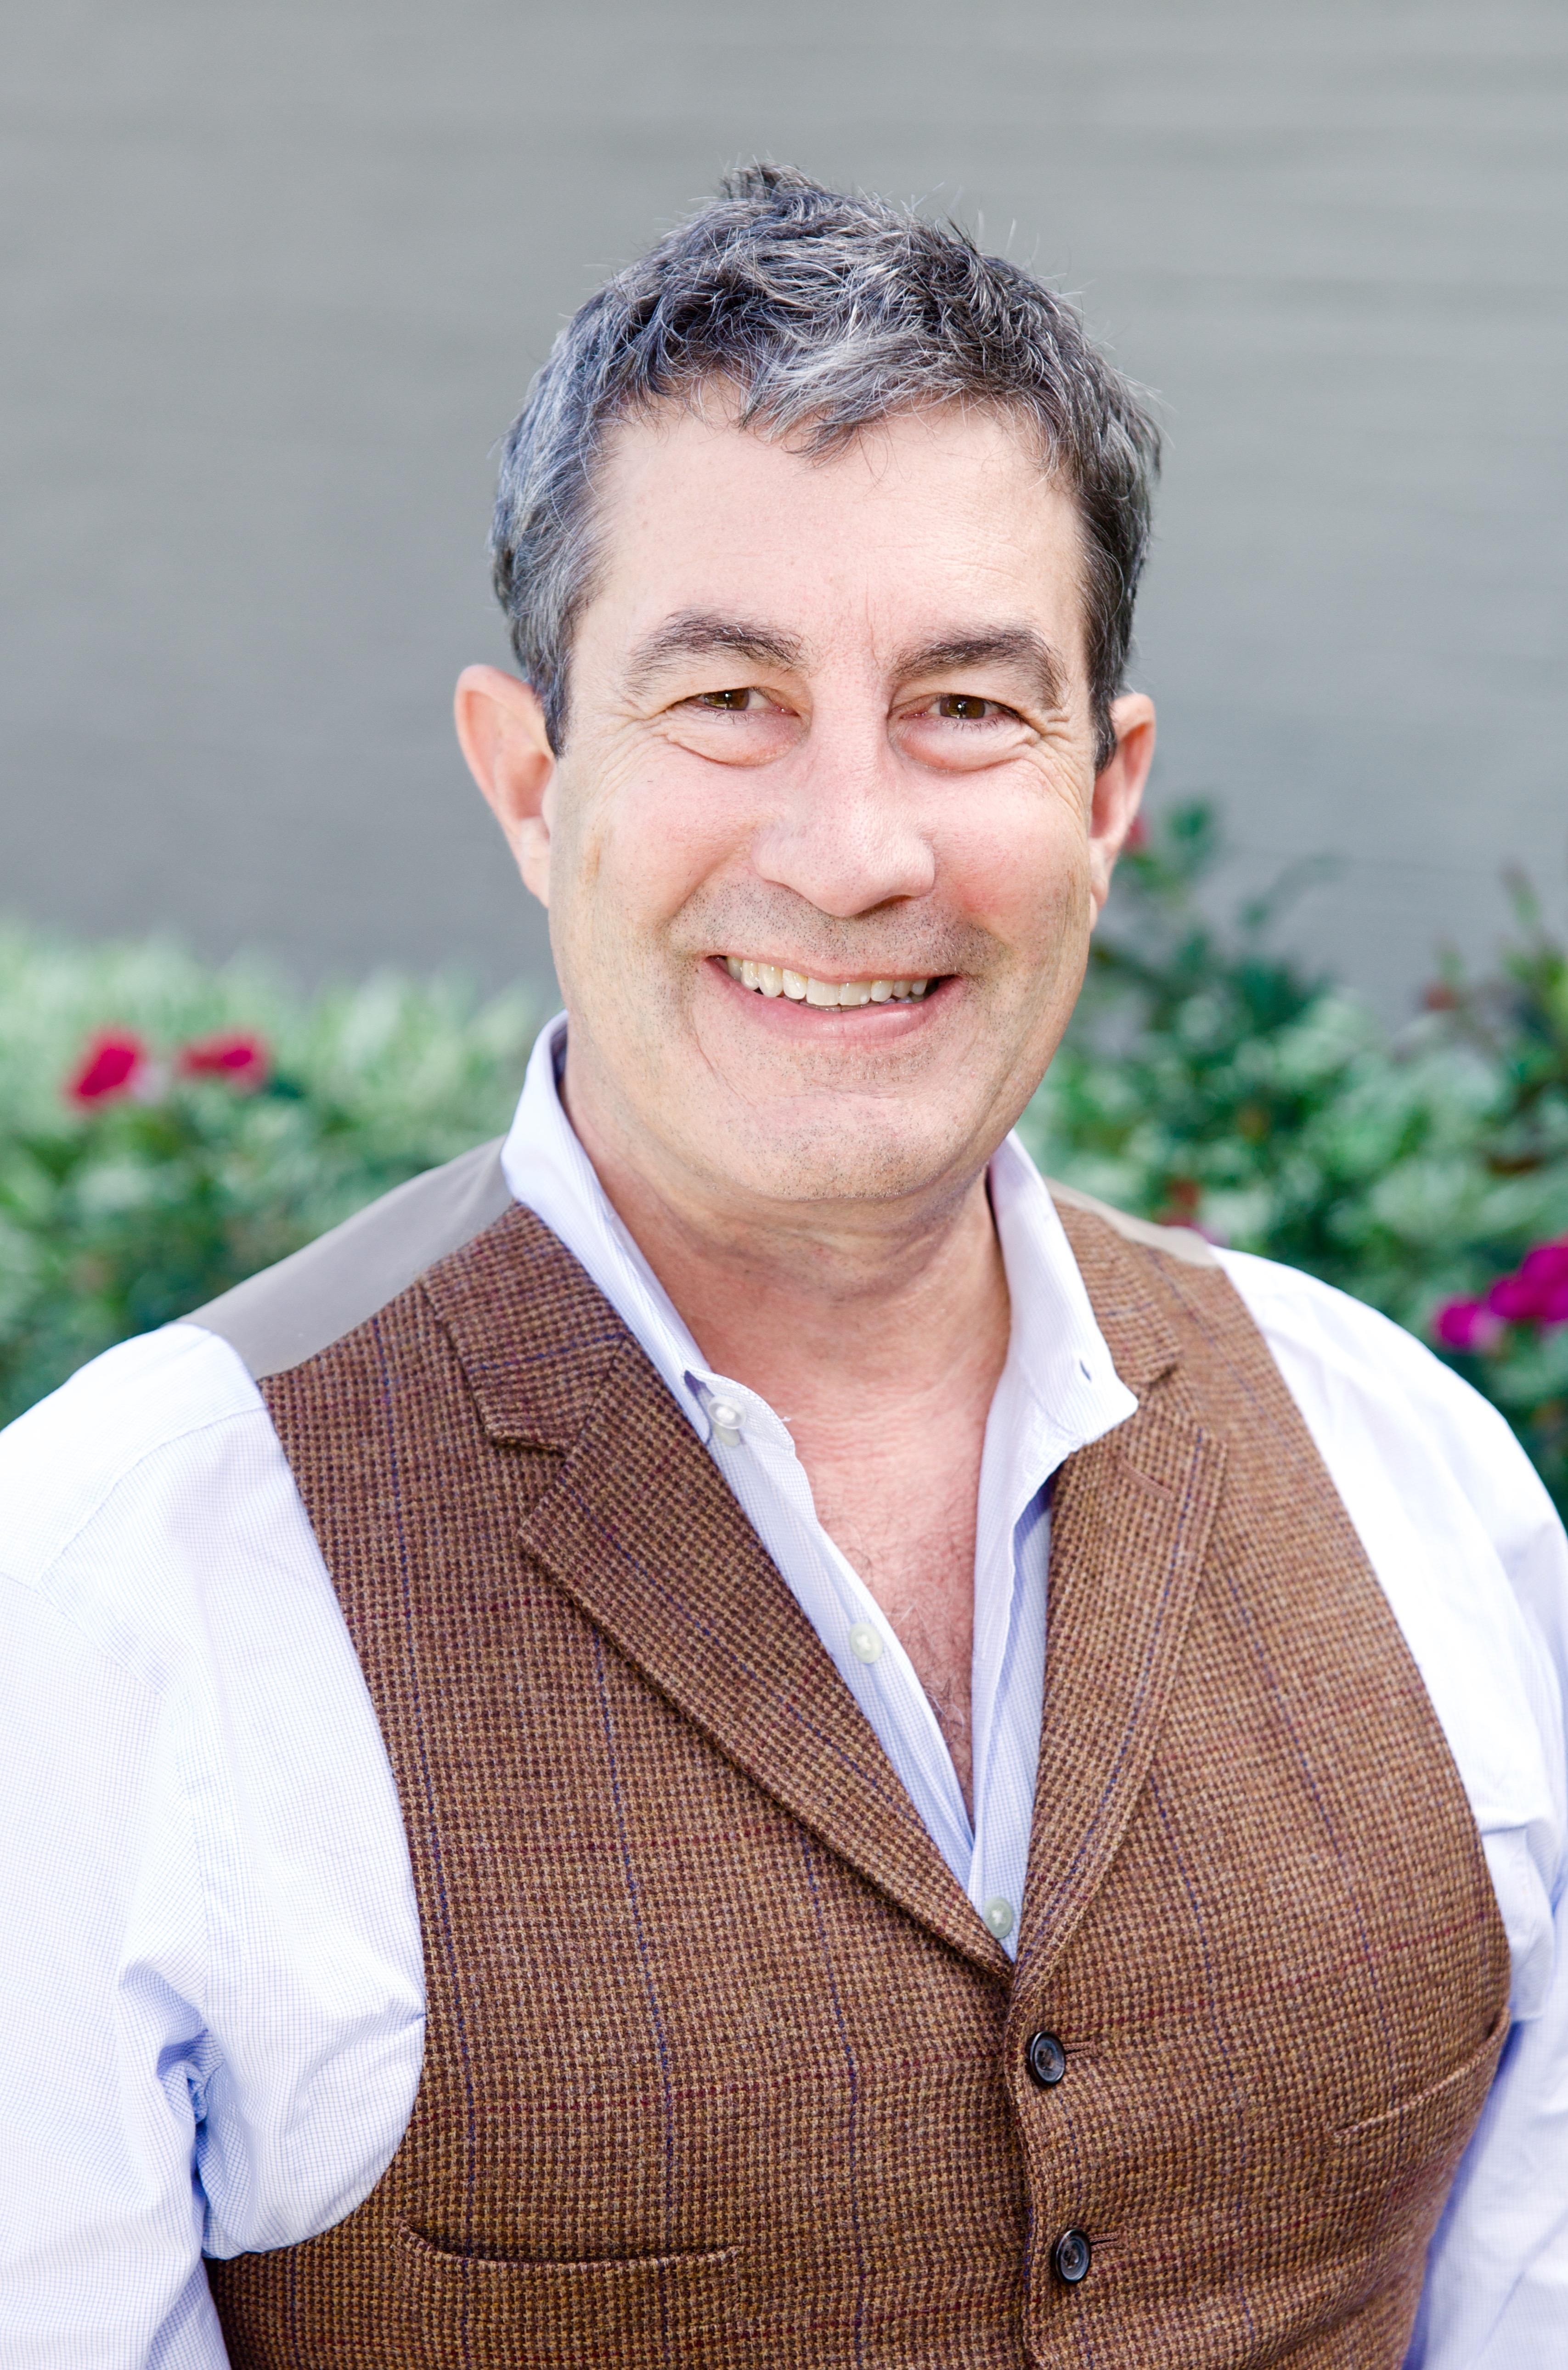 Dion McCormick